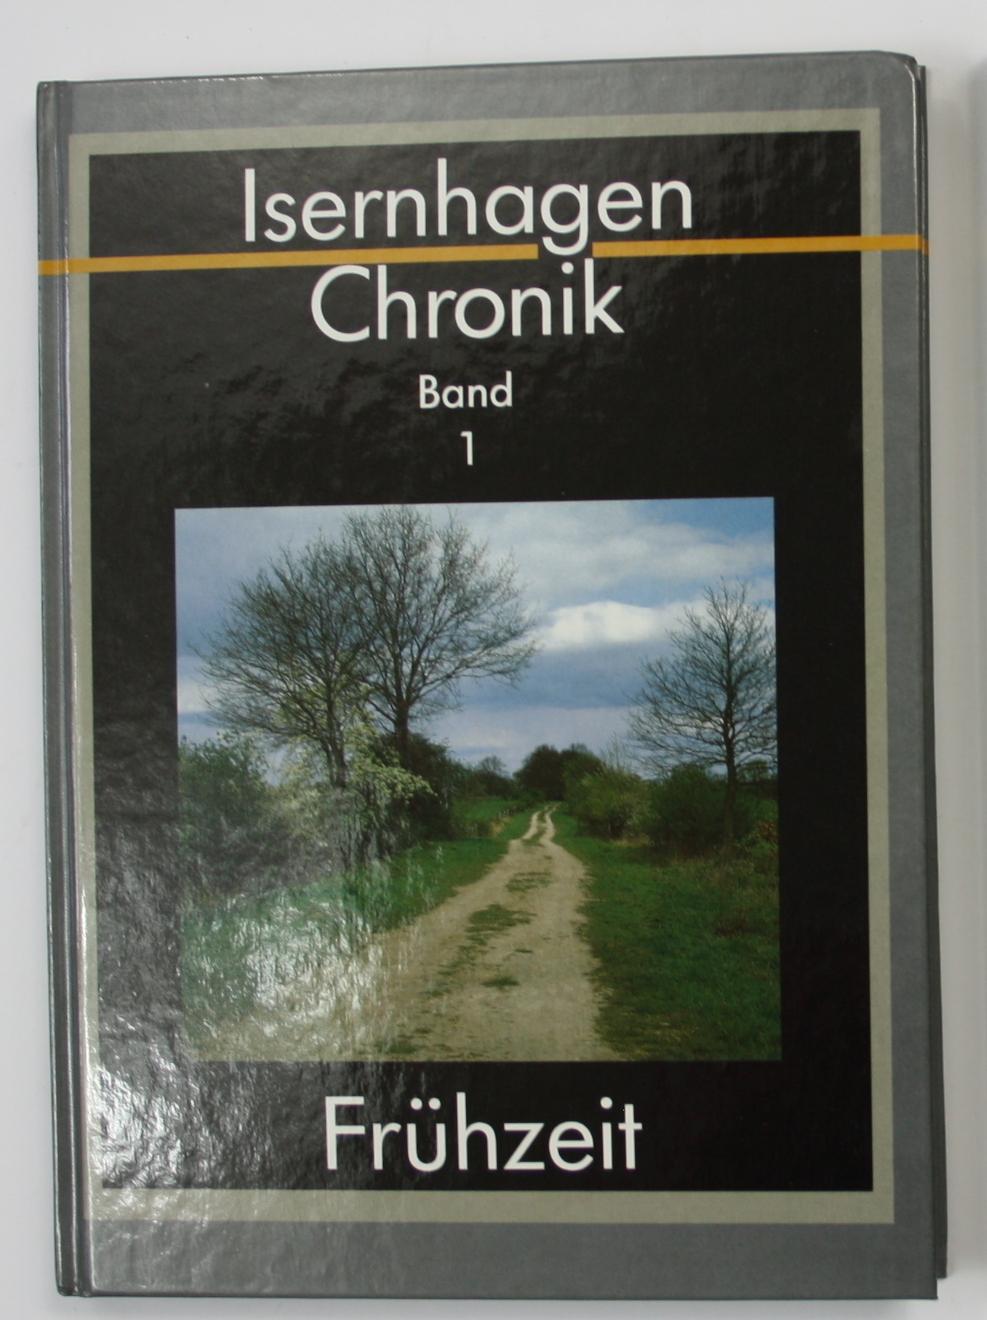 Isernhagen Chronik. Band 1. Frühzeit.: Kempf-Oldenburg, Claudia M.A.